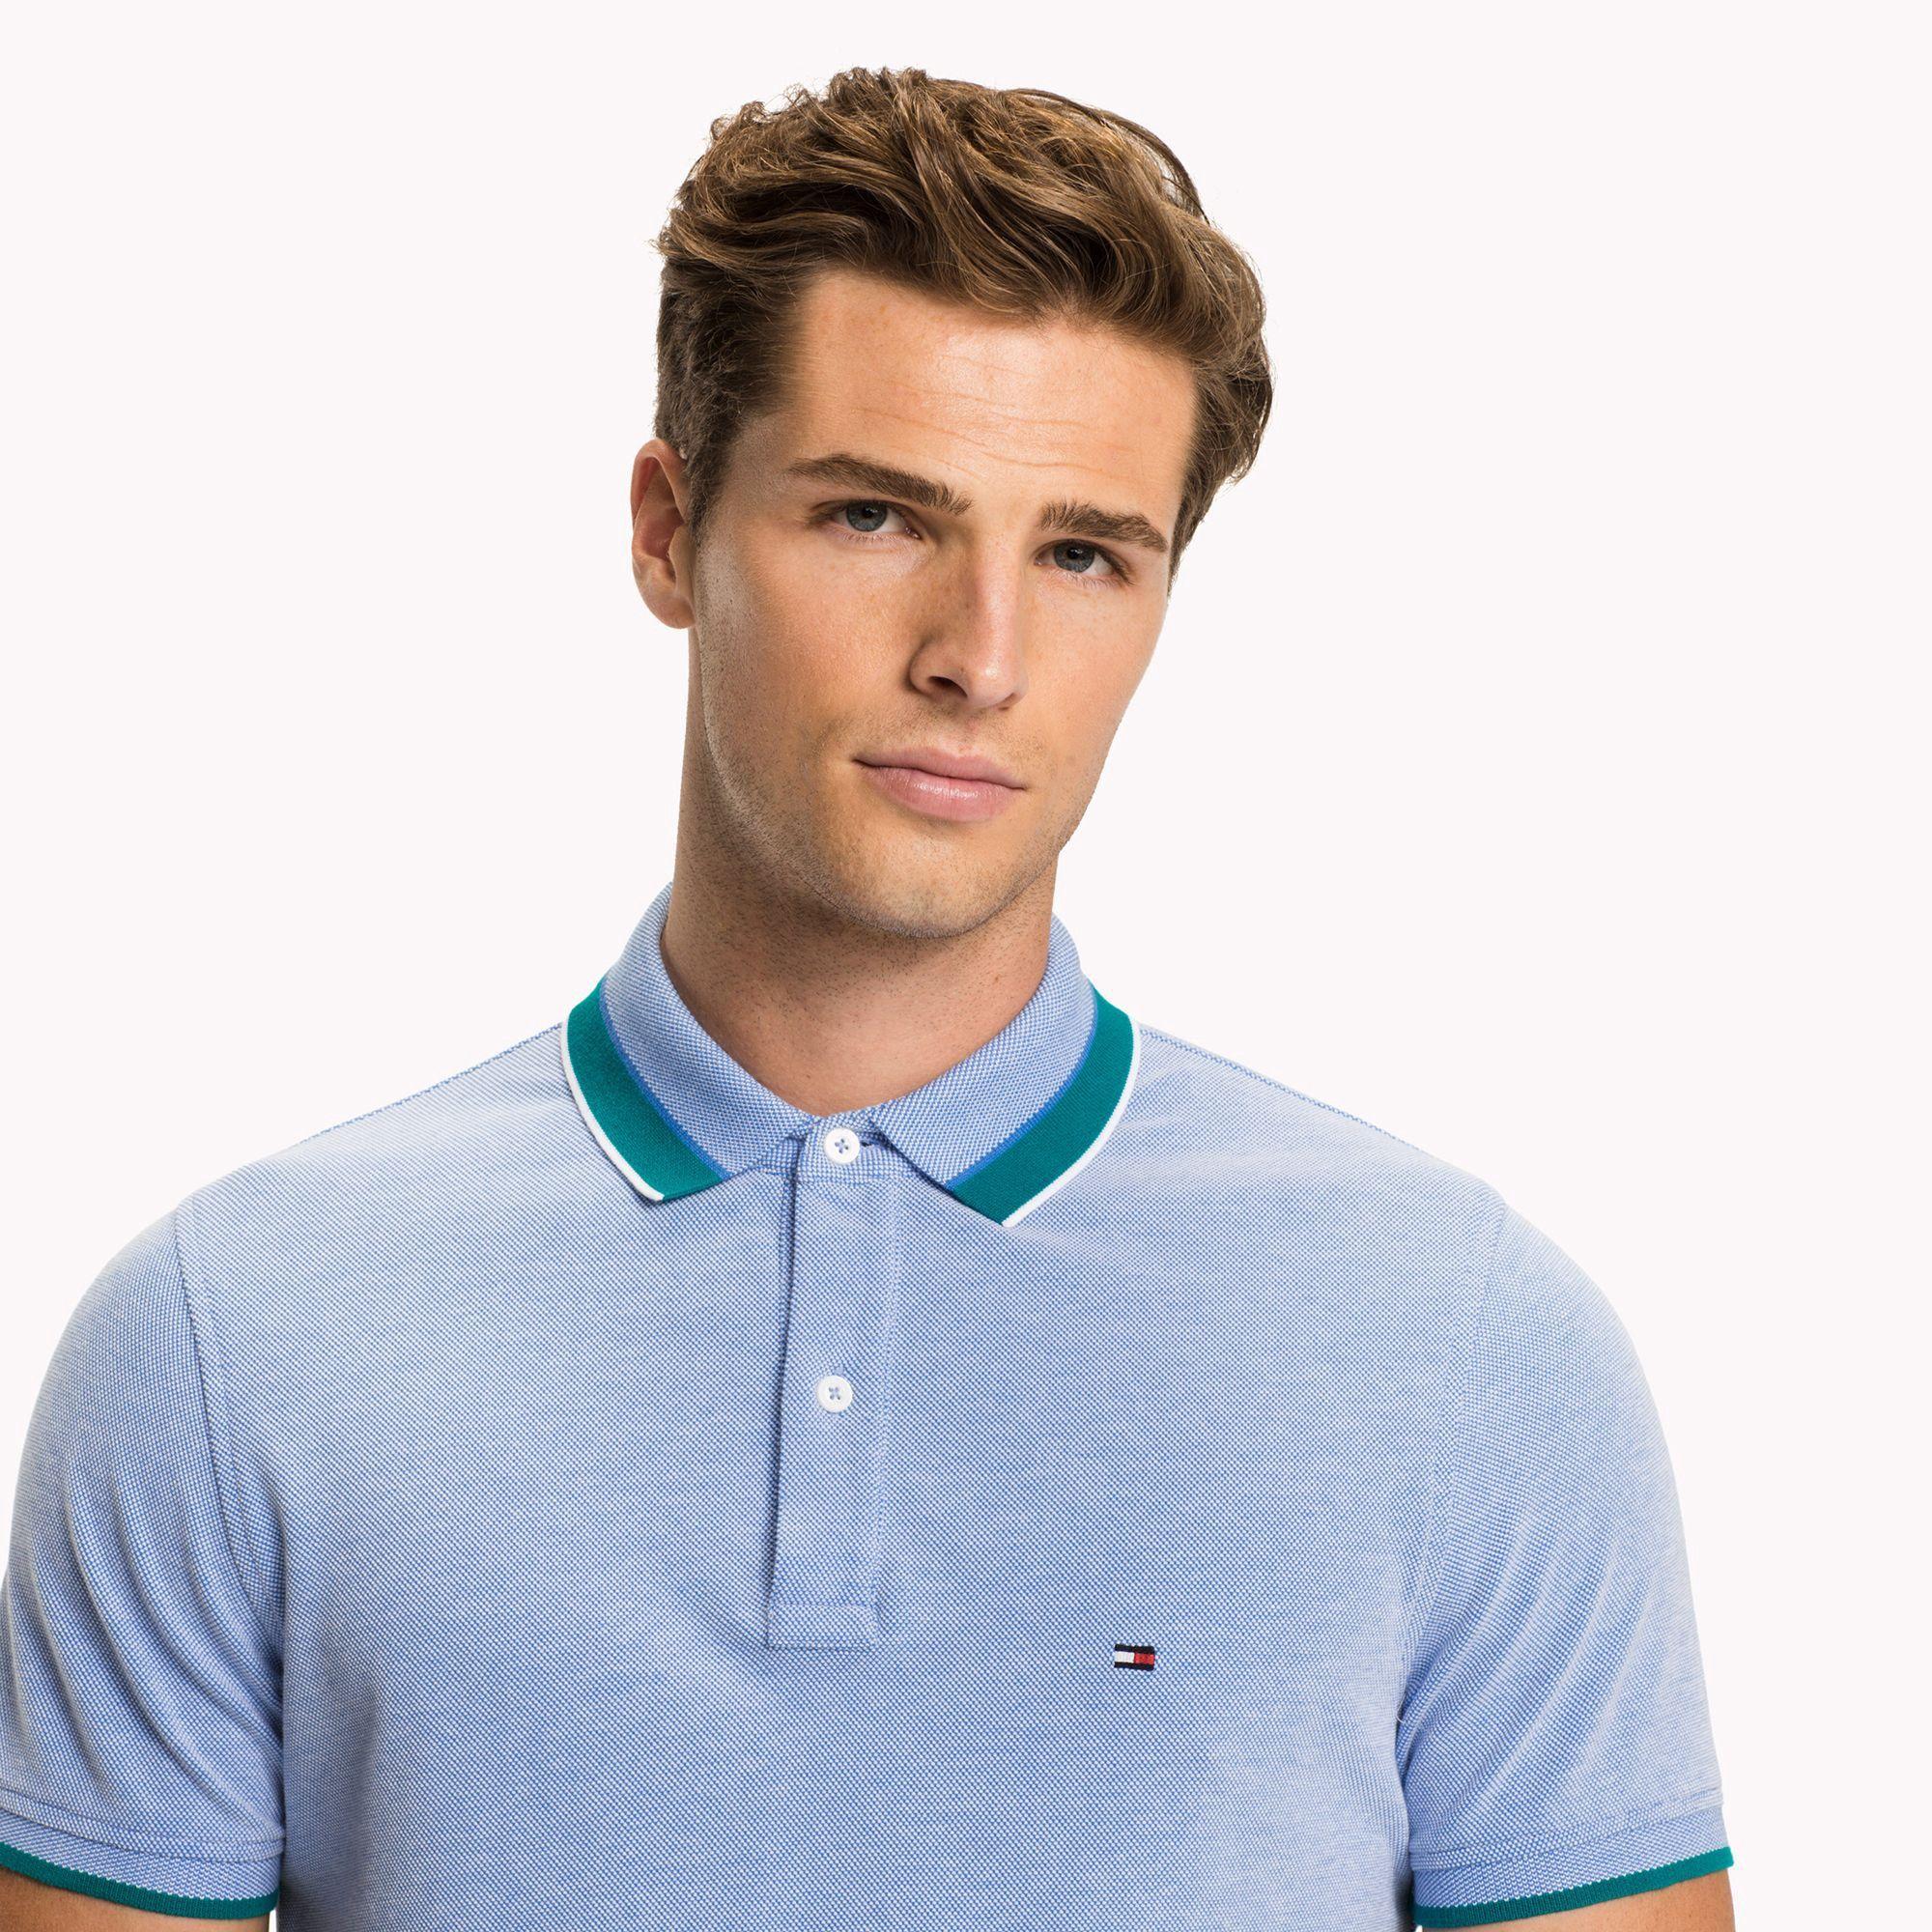 TOMMY HILFIGER Tommy Hilfiger Stretch Slim Fit T shirt Blue